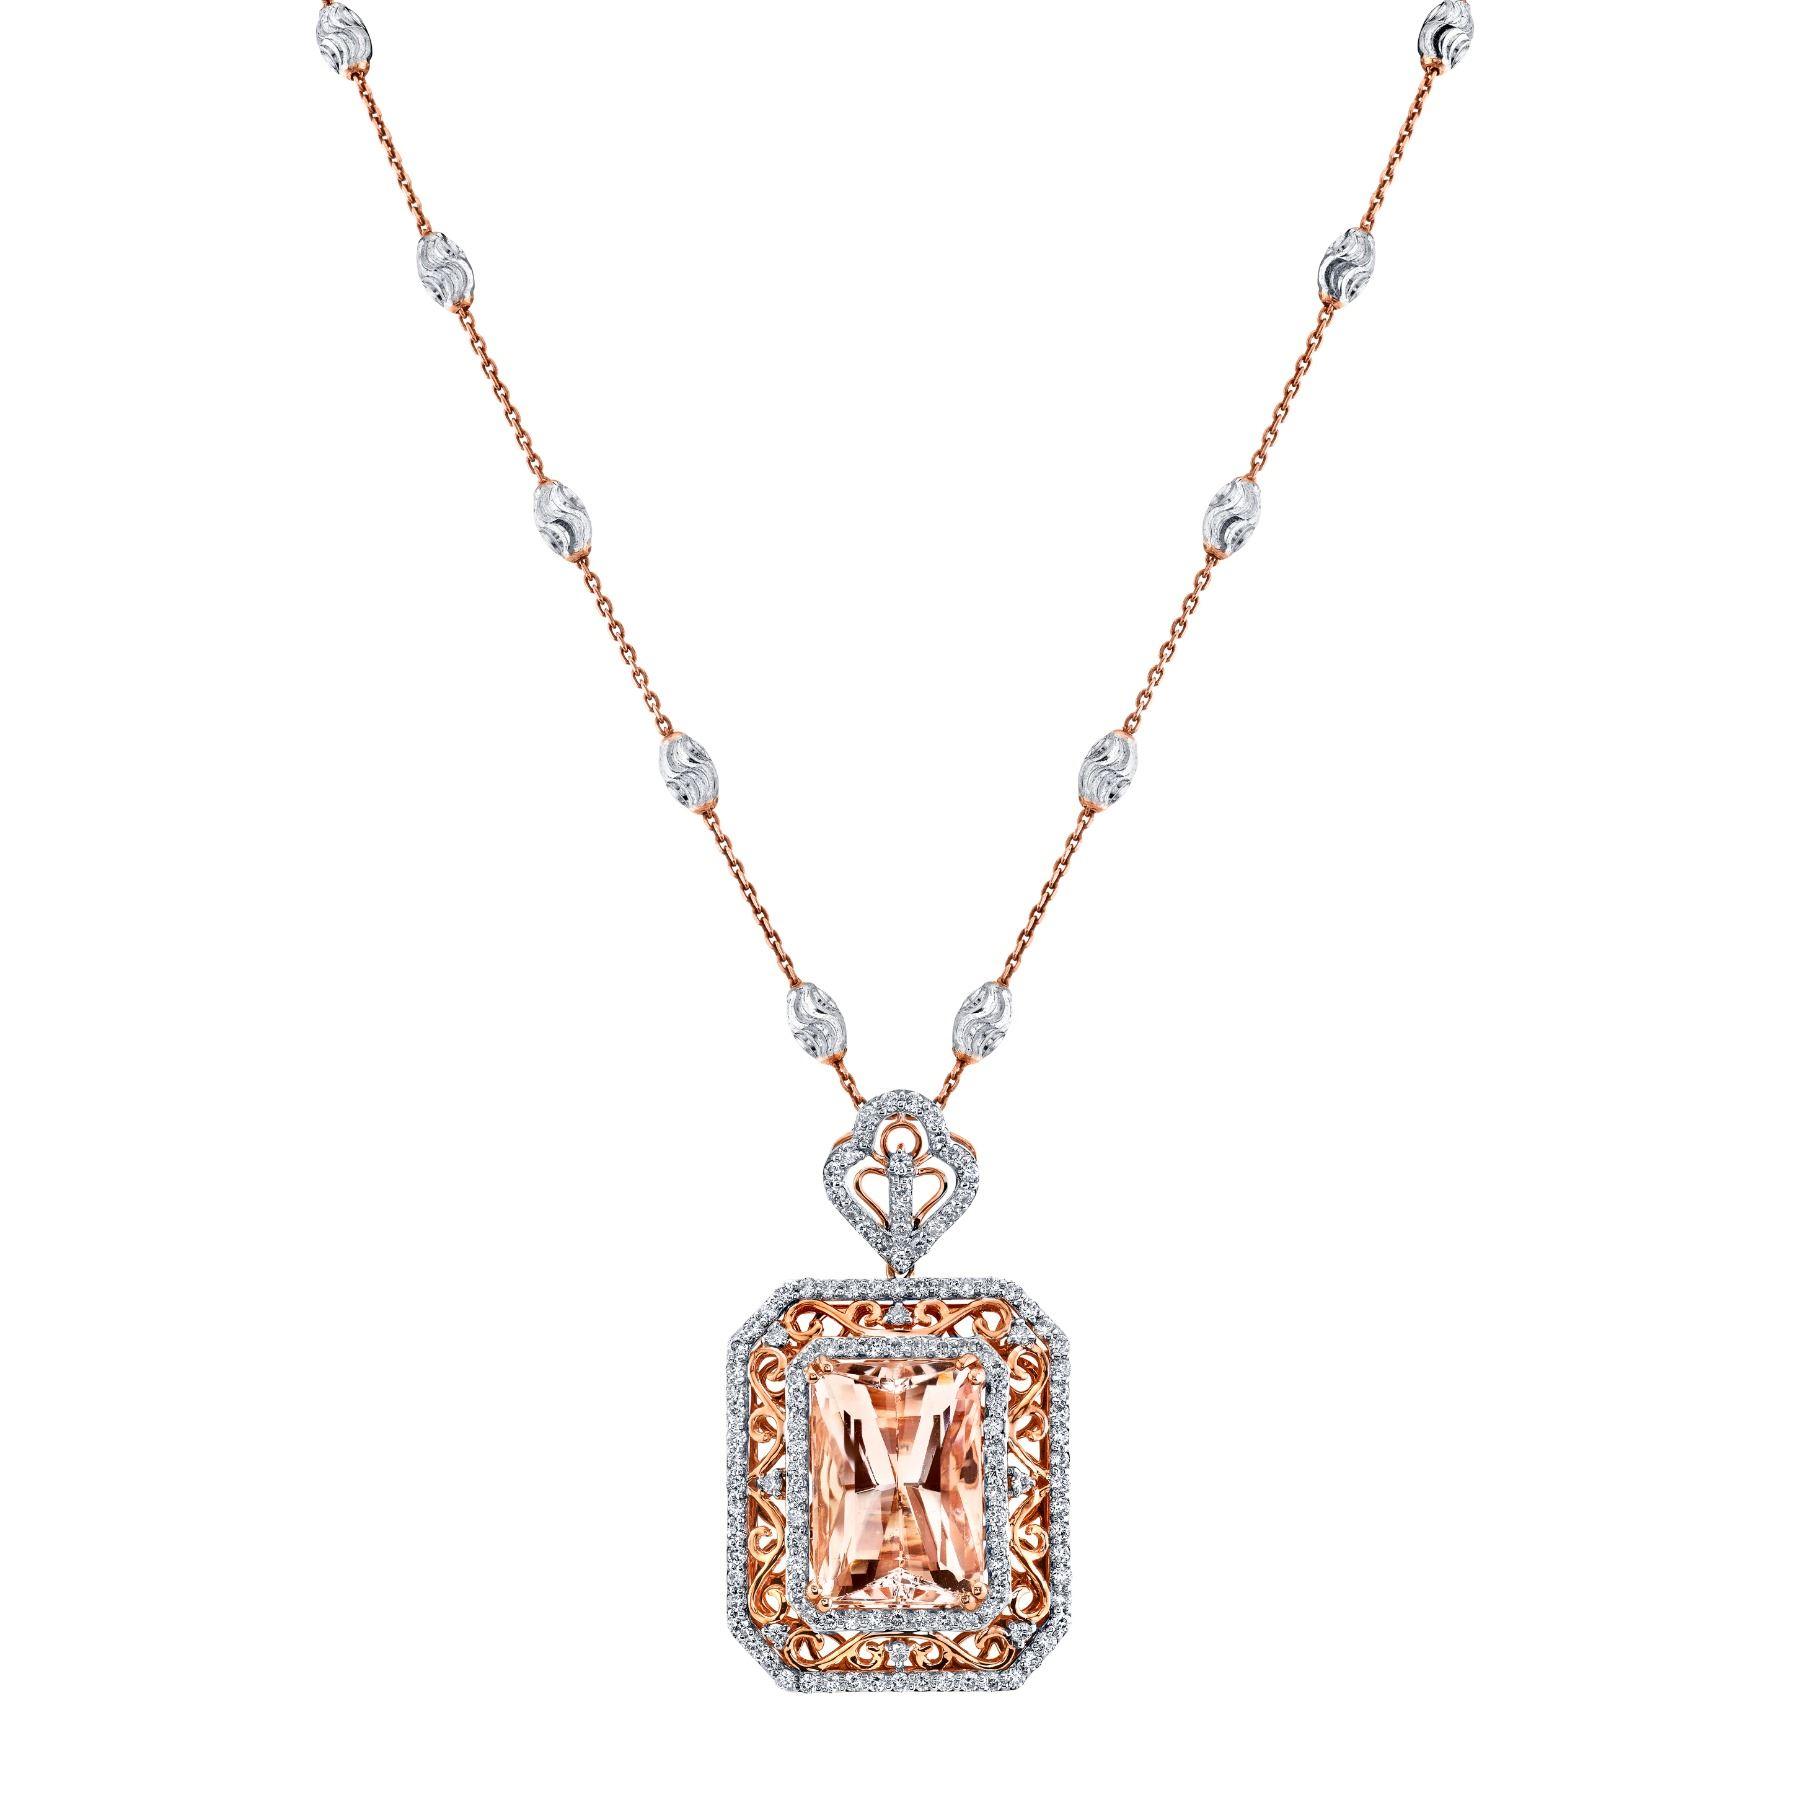 MORGANITE & DIAMOND NECKLACE BARANOF JEWELERS